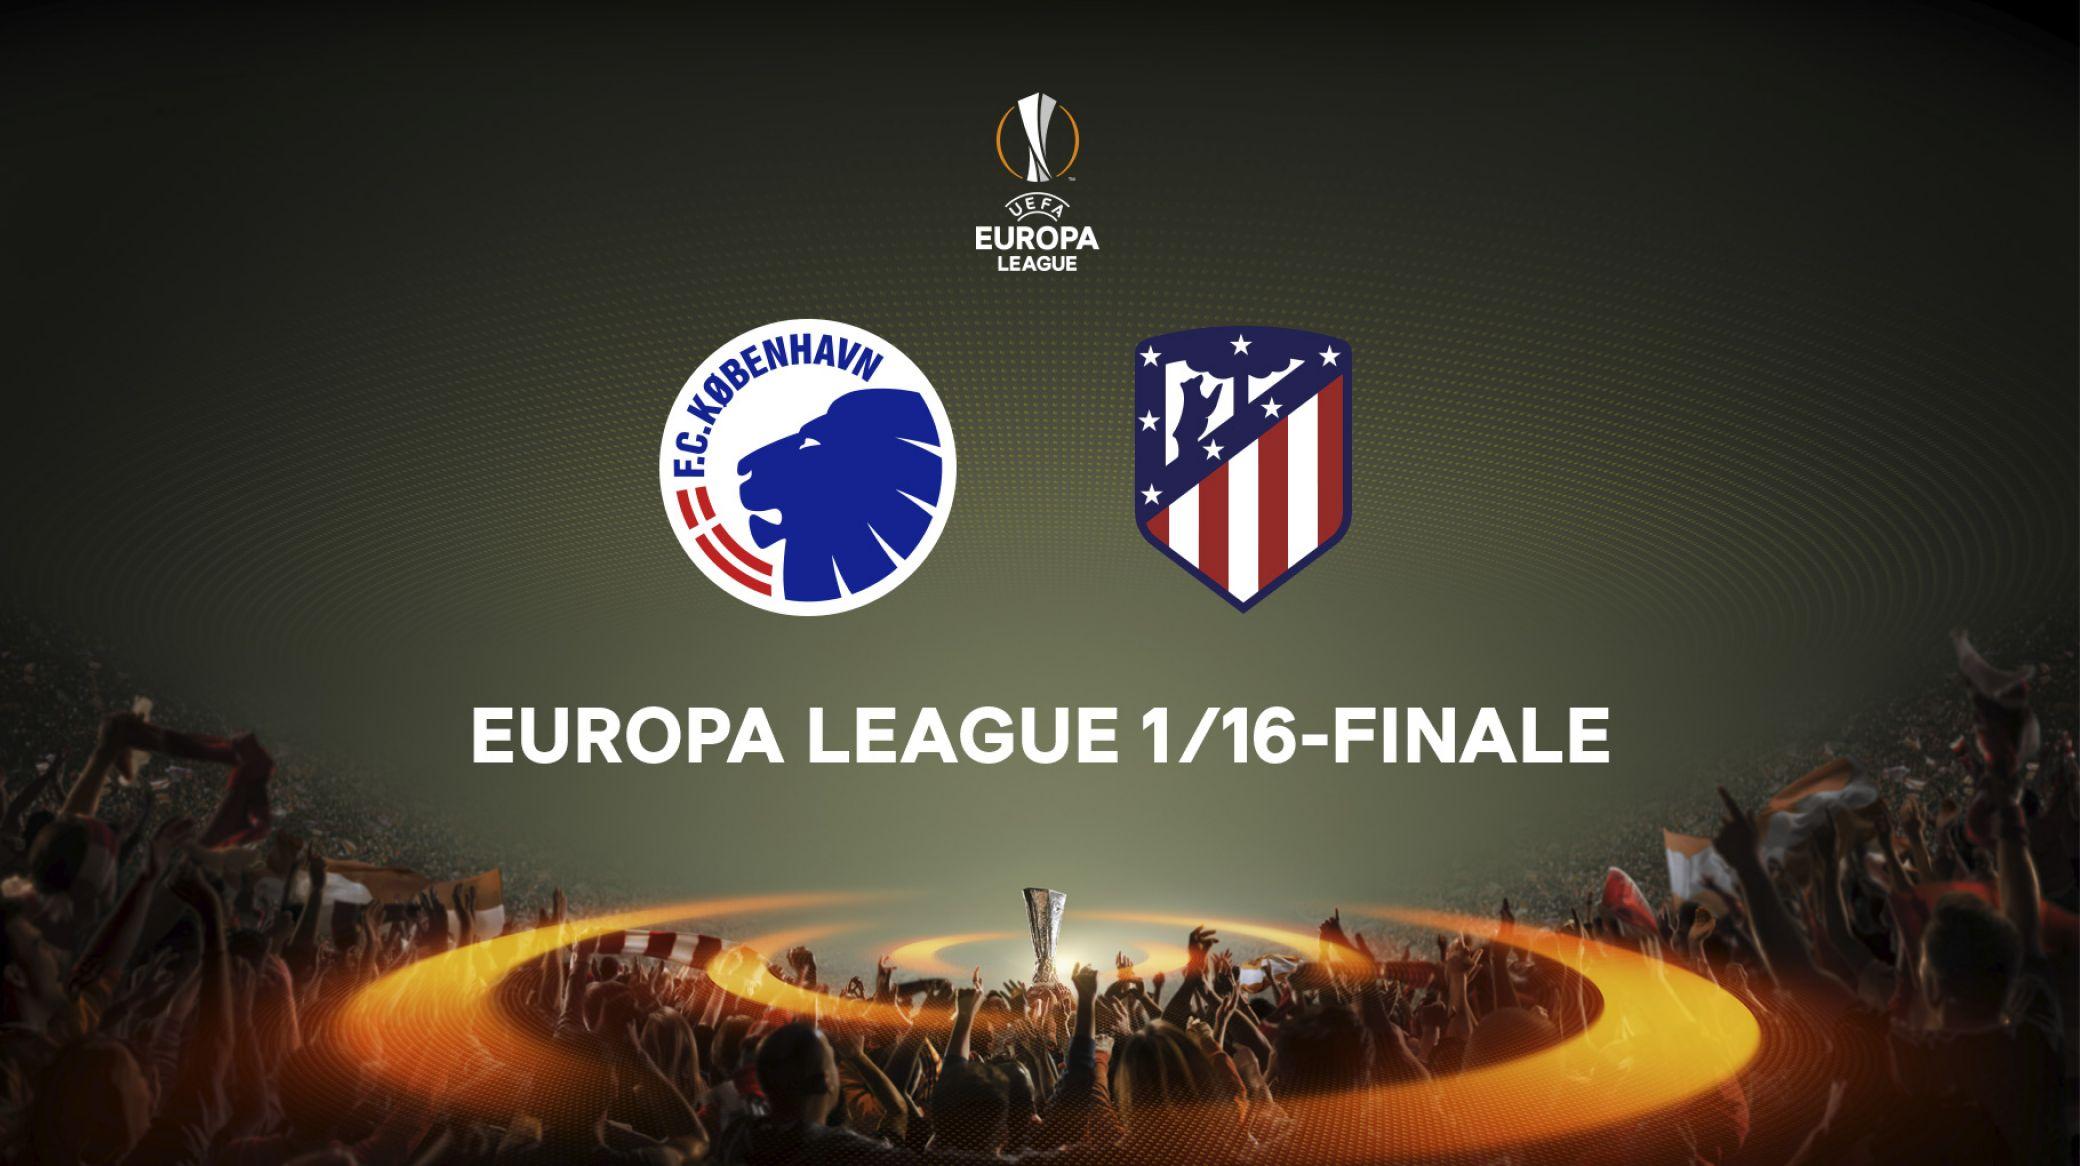 Atlético Madrid awaits in UEFA Europa League   F.C. København